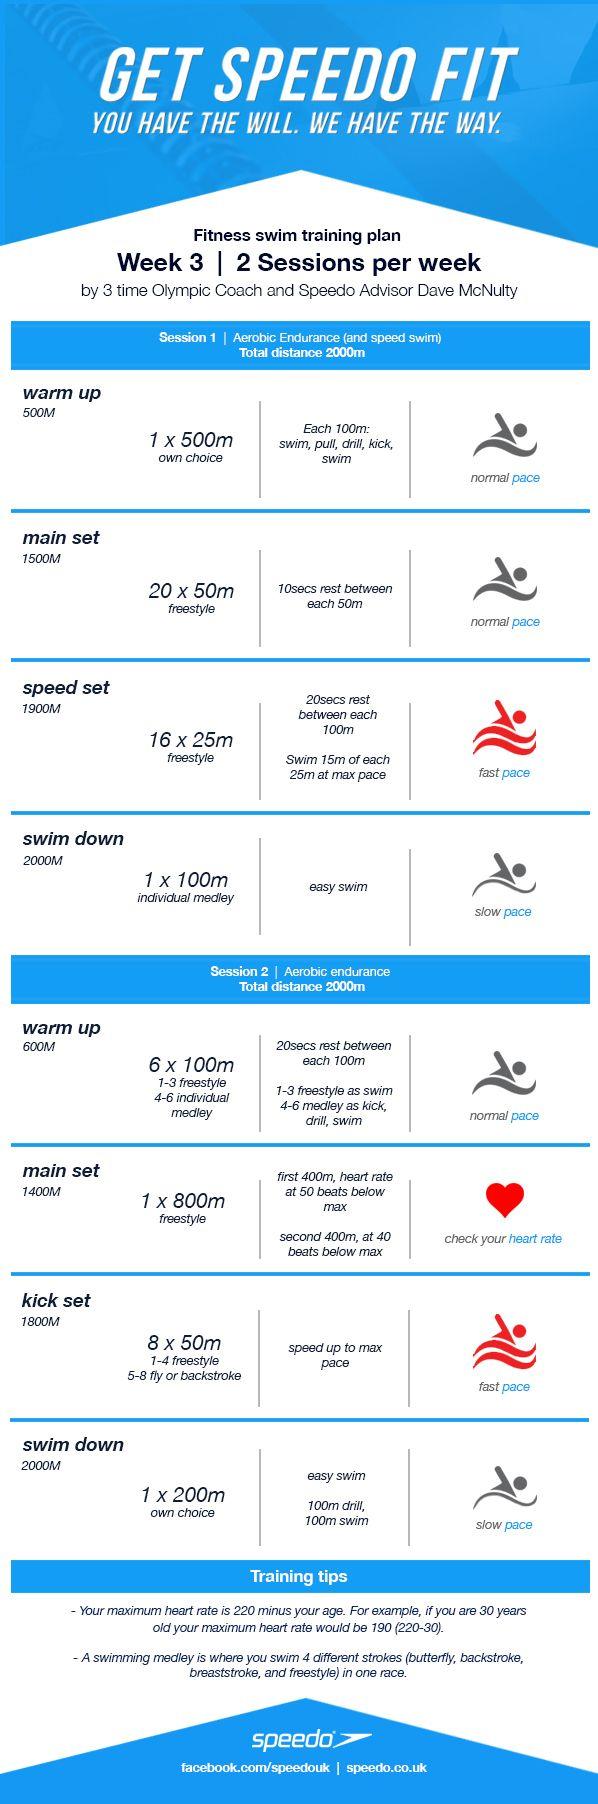 This Week S Swim Training Plan Focuses On Aerobic Endurance After